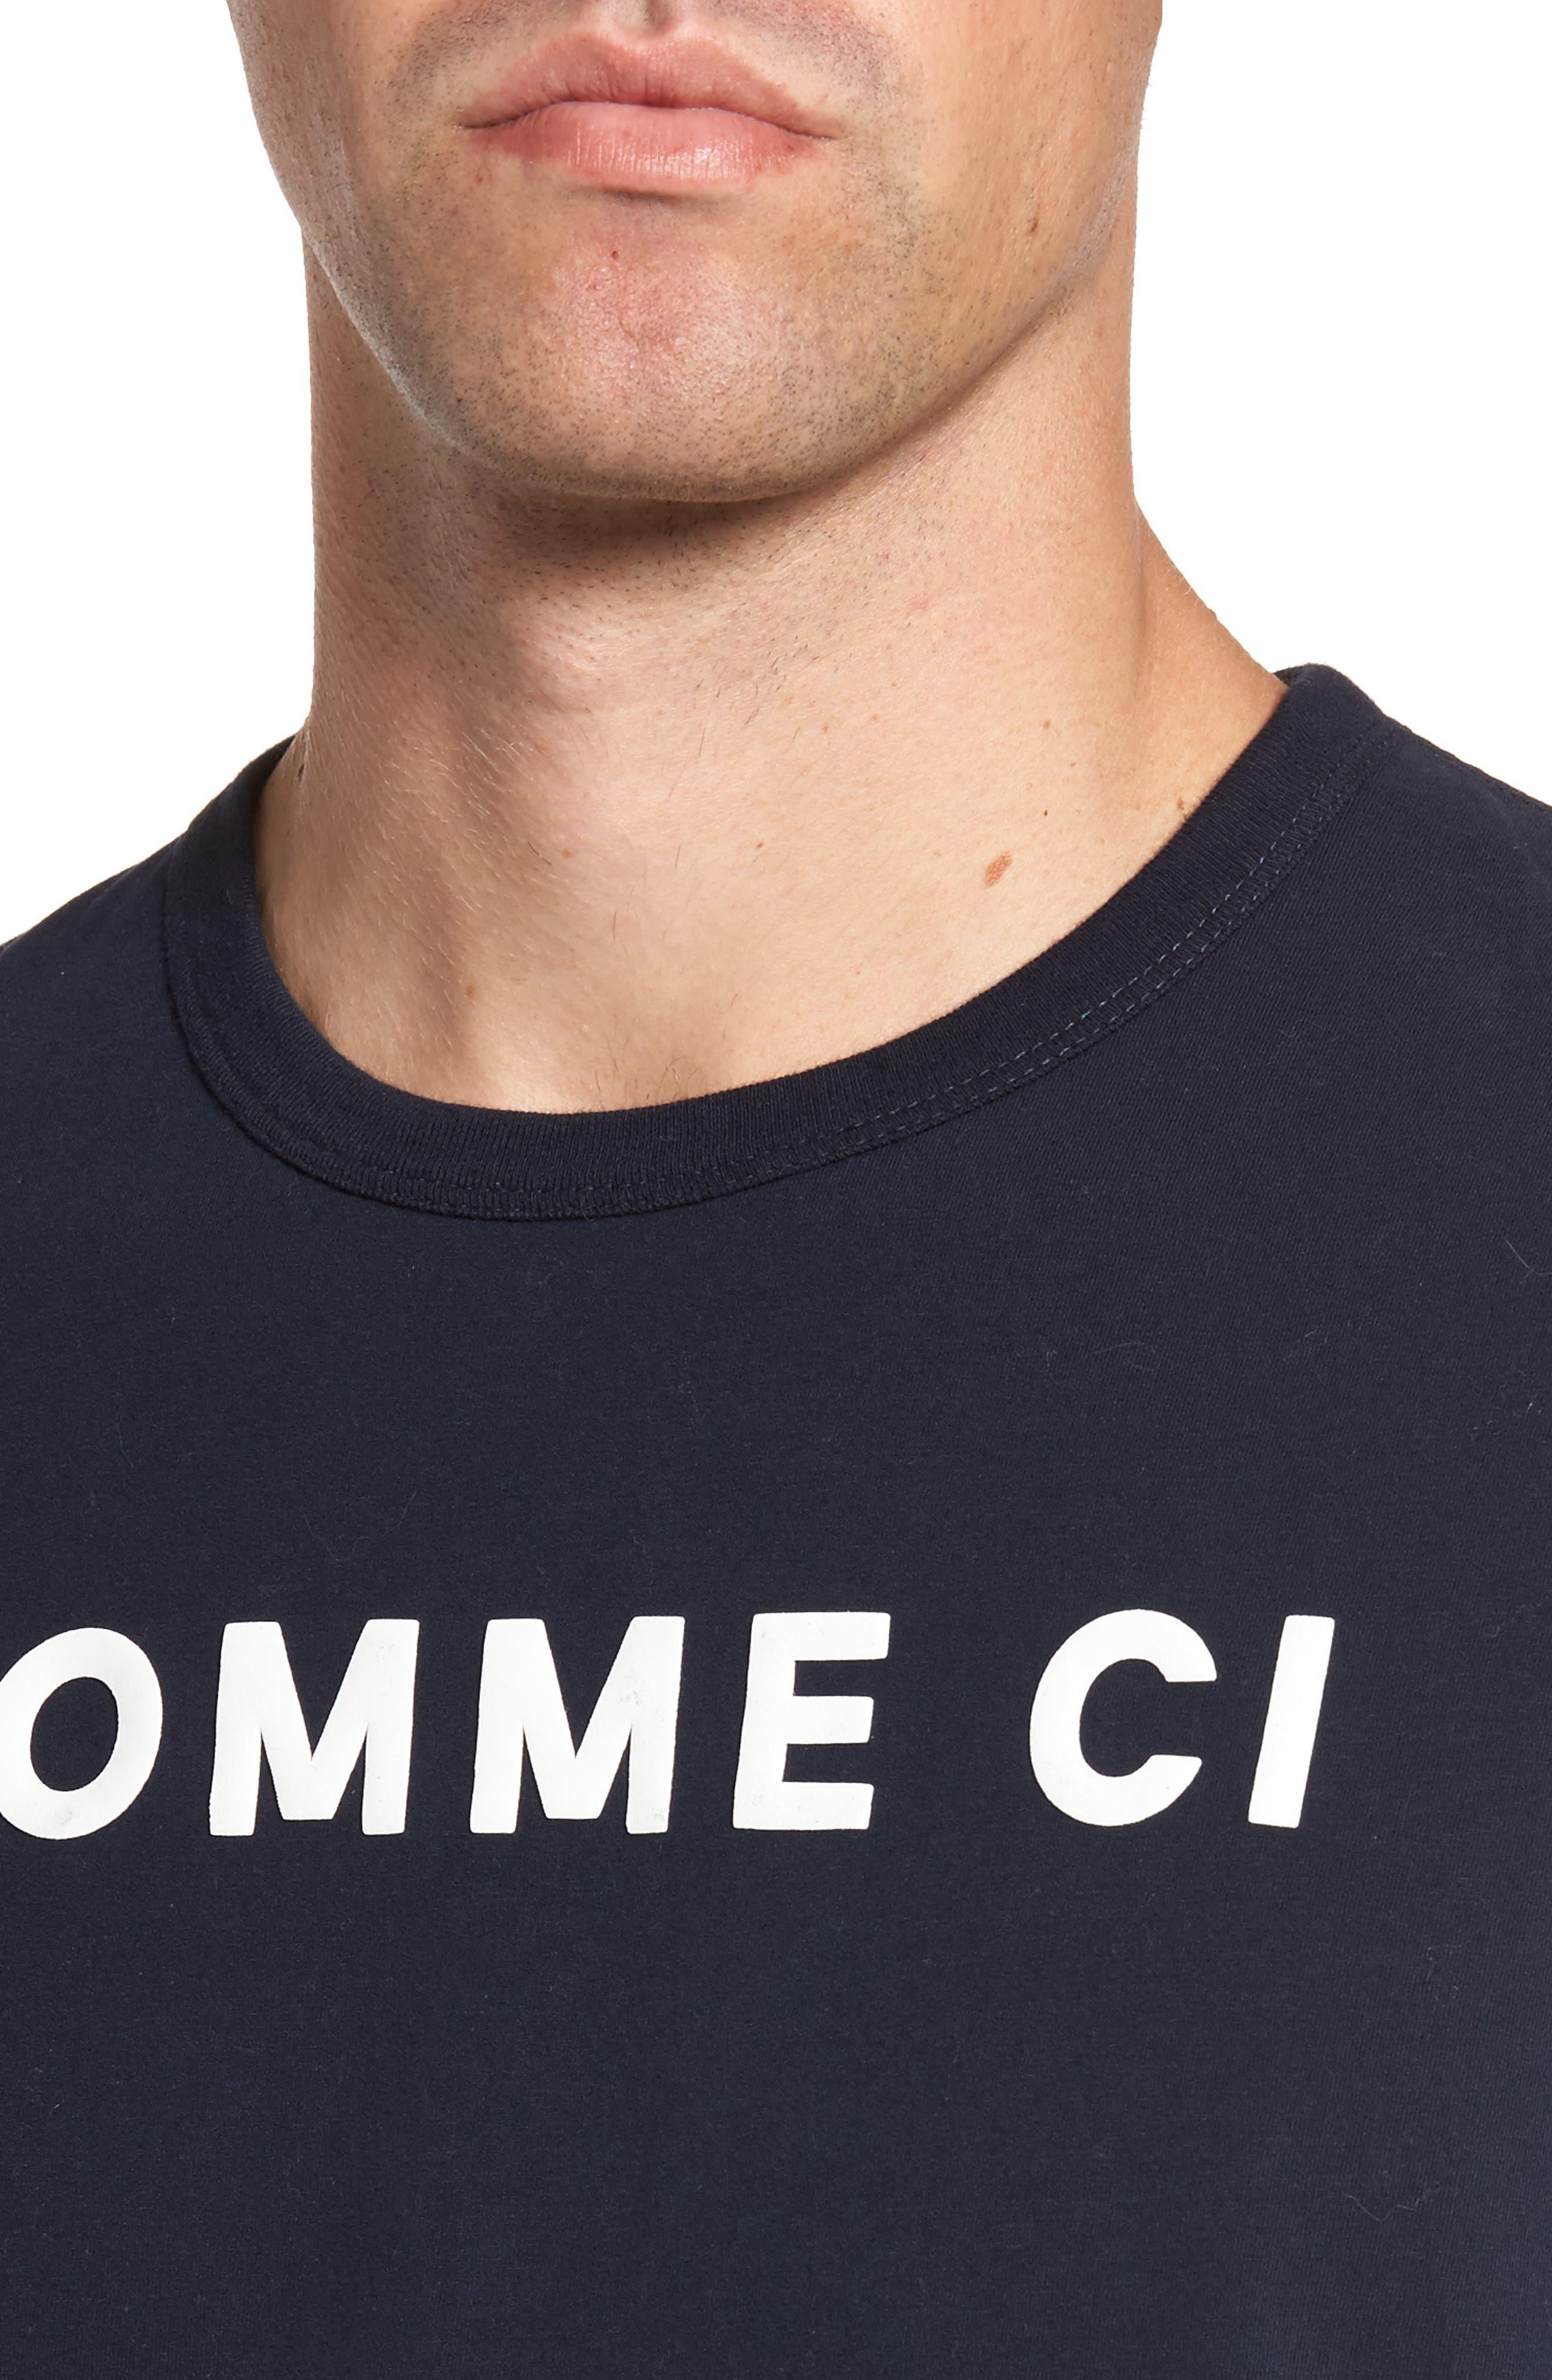 FRENCH CONNECTION,                             Comme Ci Comme Ça Regular Fit T-Shirt,                             Alternate thumbnail 4, color,                             404